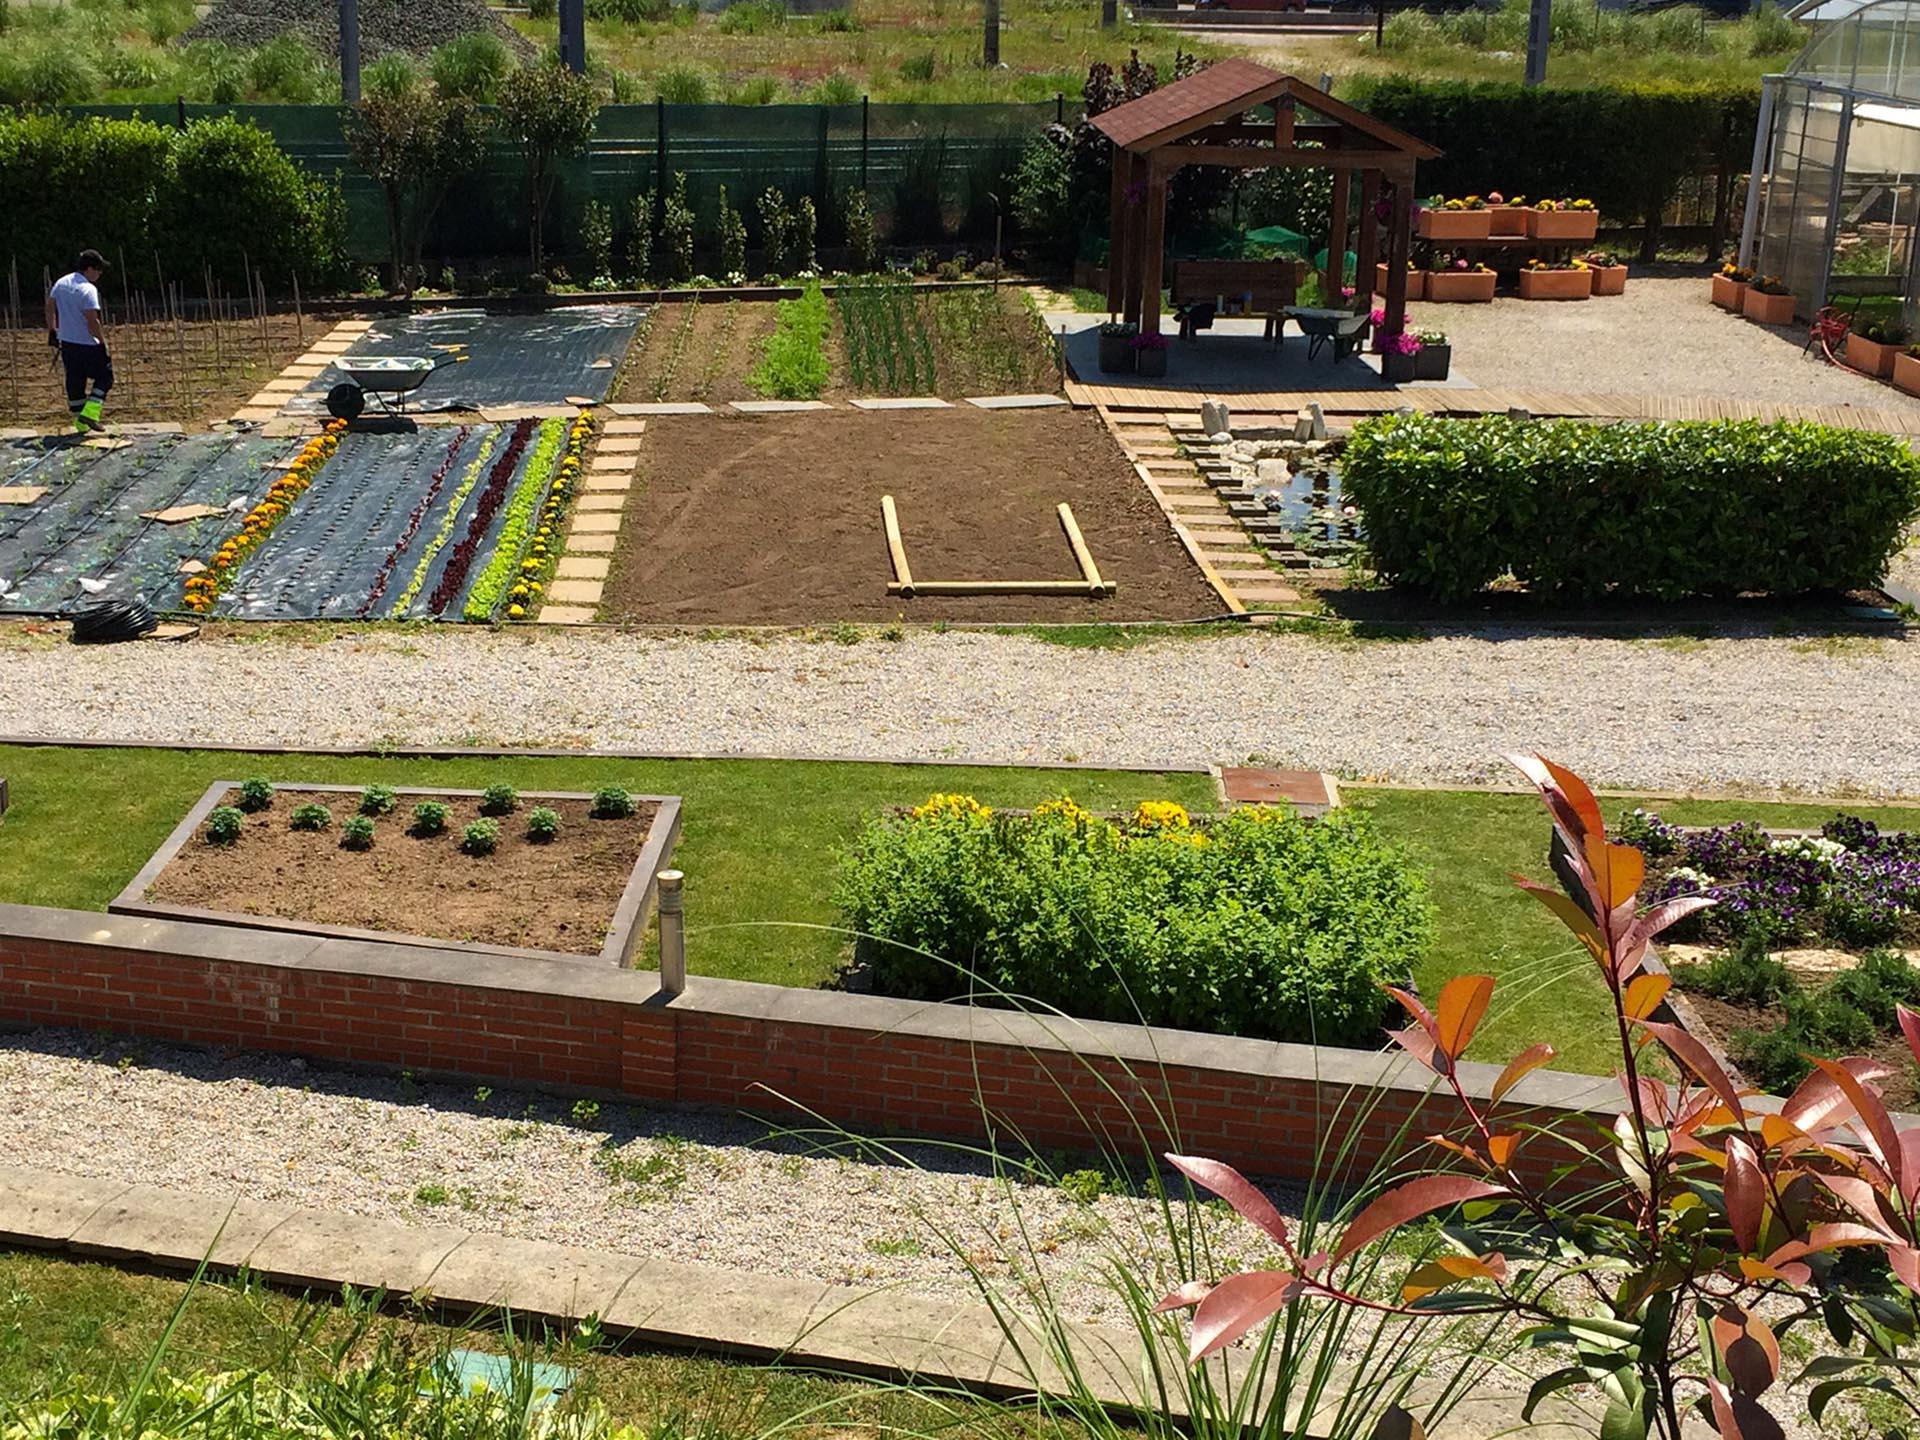 Horticultura y Floricultura